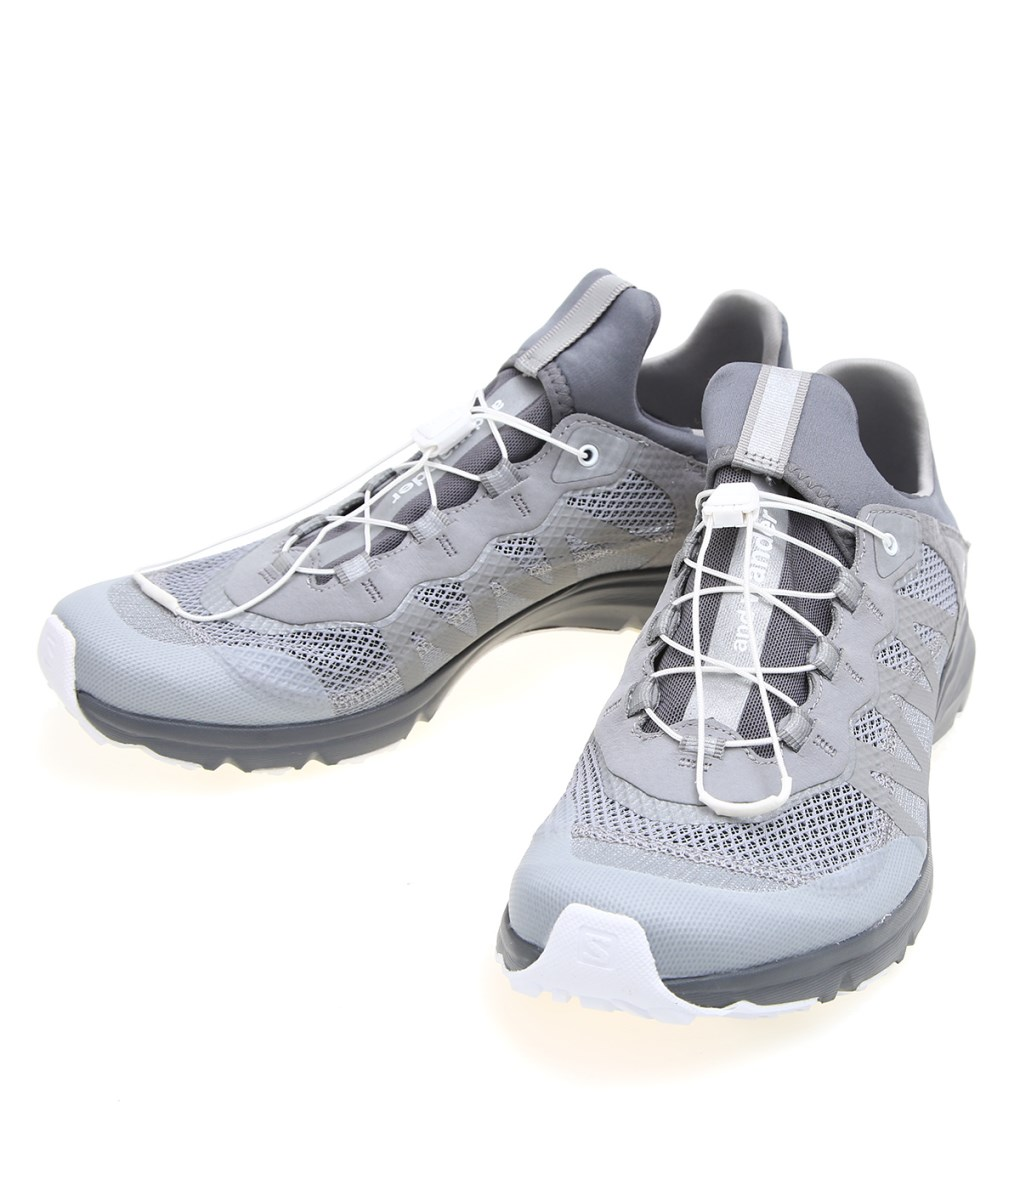 and wander / アンドワンダー : reflective mesh sneaker by salomon : AA01-AA128 スニーカー サロモン ダブルネーム 靴 メンズ : 574-0178001 【PIE】